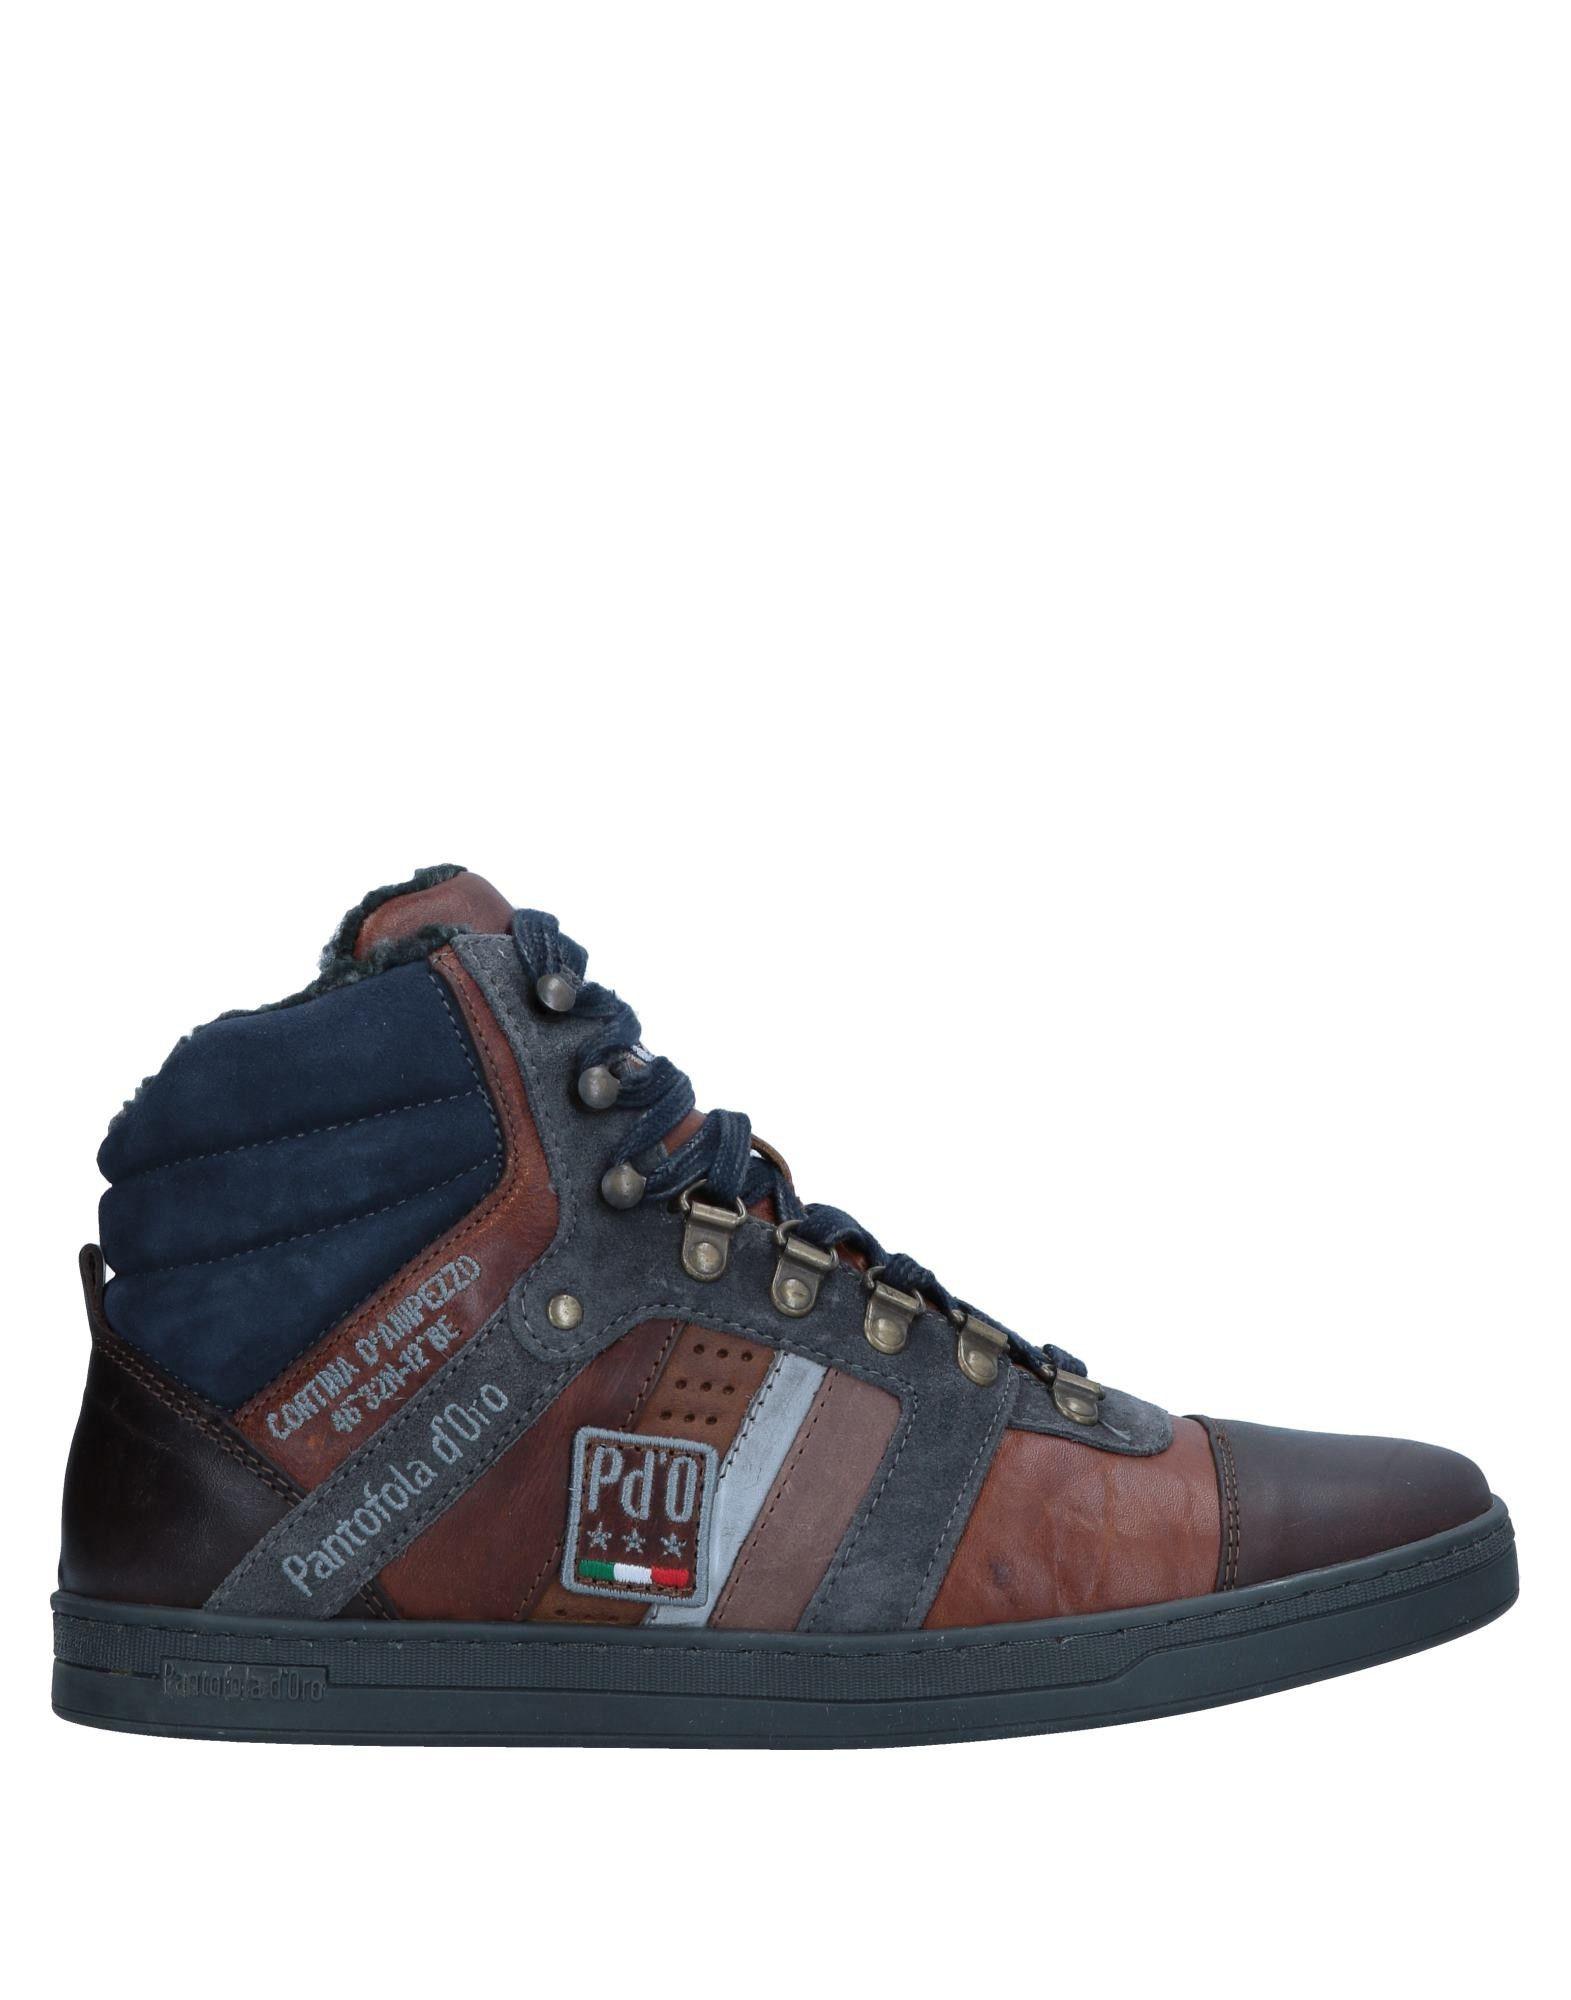 Rabatt Stiefelette echte Schuhe Pantofola D'oro Stiefelette Rabatt Herren  11545452TB fbc976